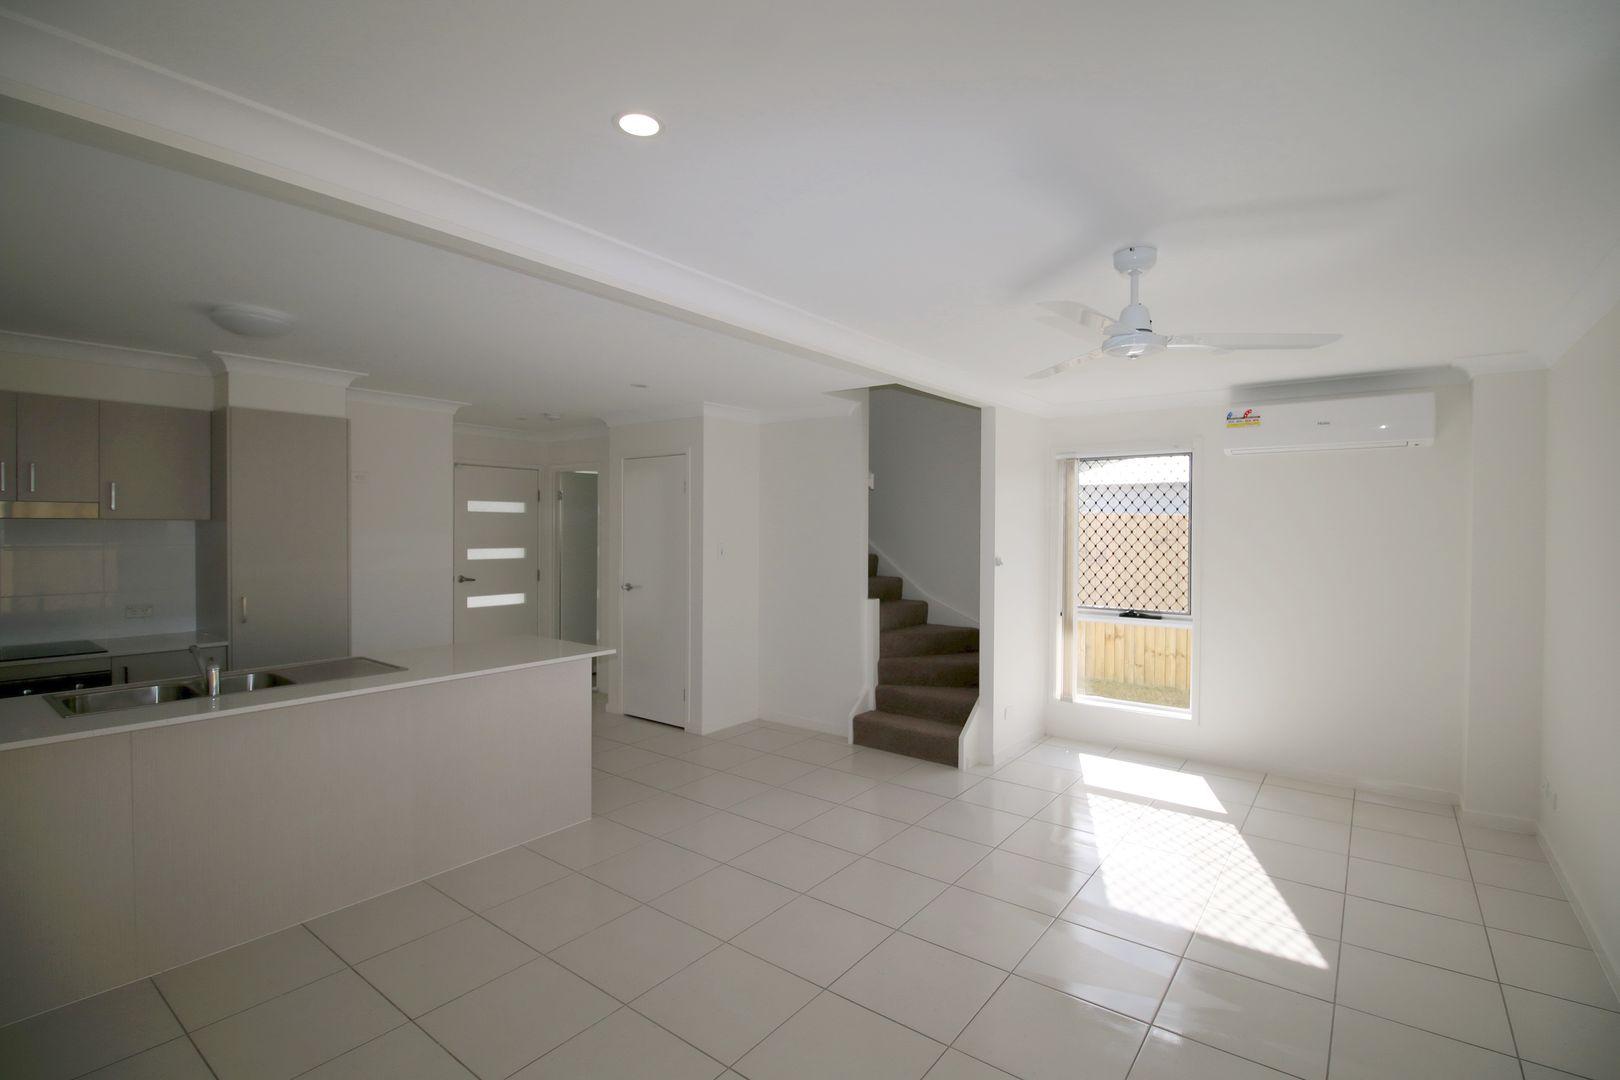 8/10 costalot street, Oxley QLD 4075, Image 1